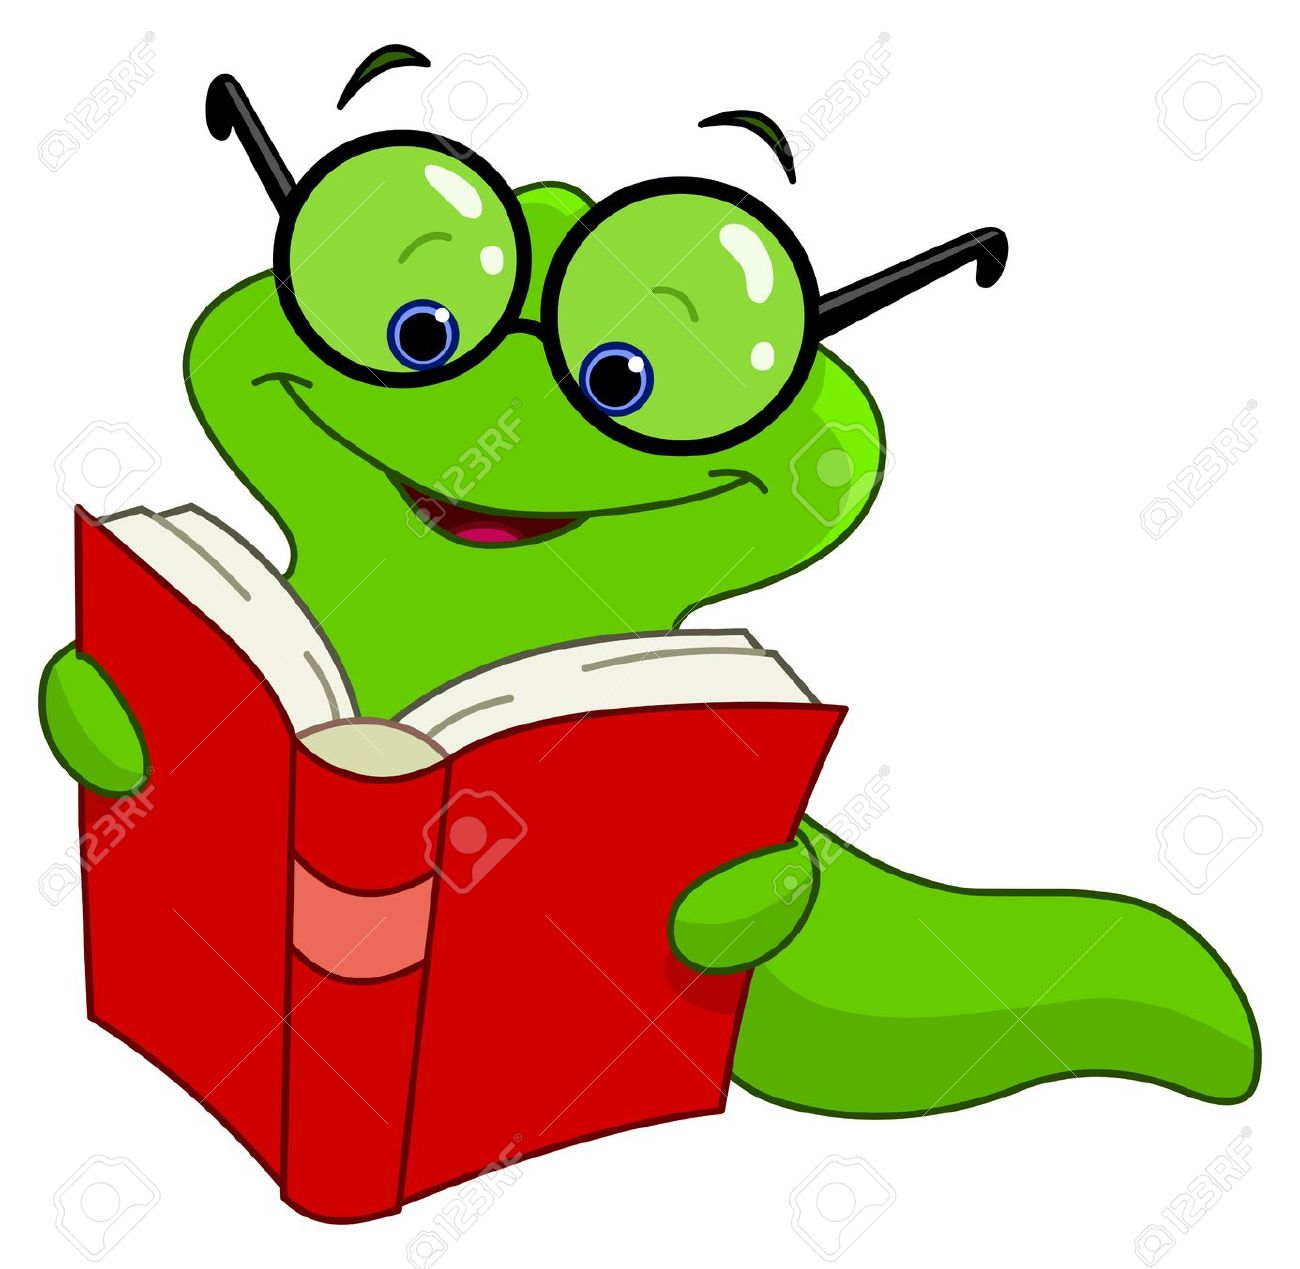 book worm: Book worm